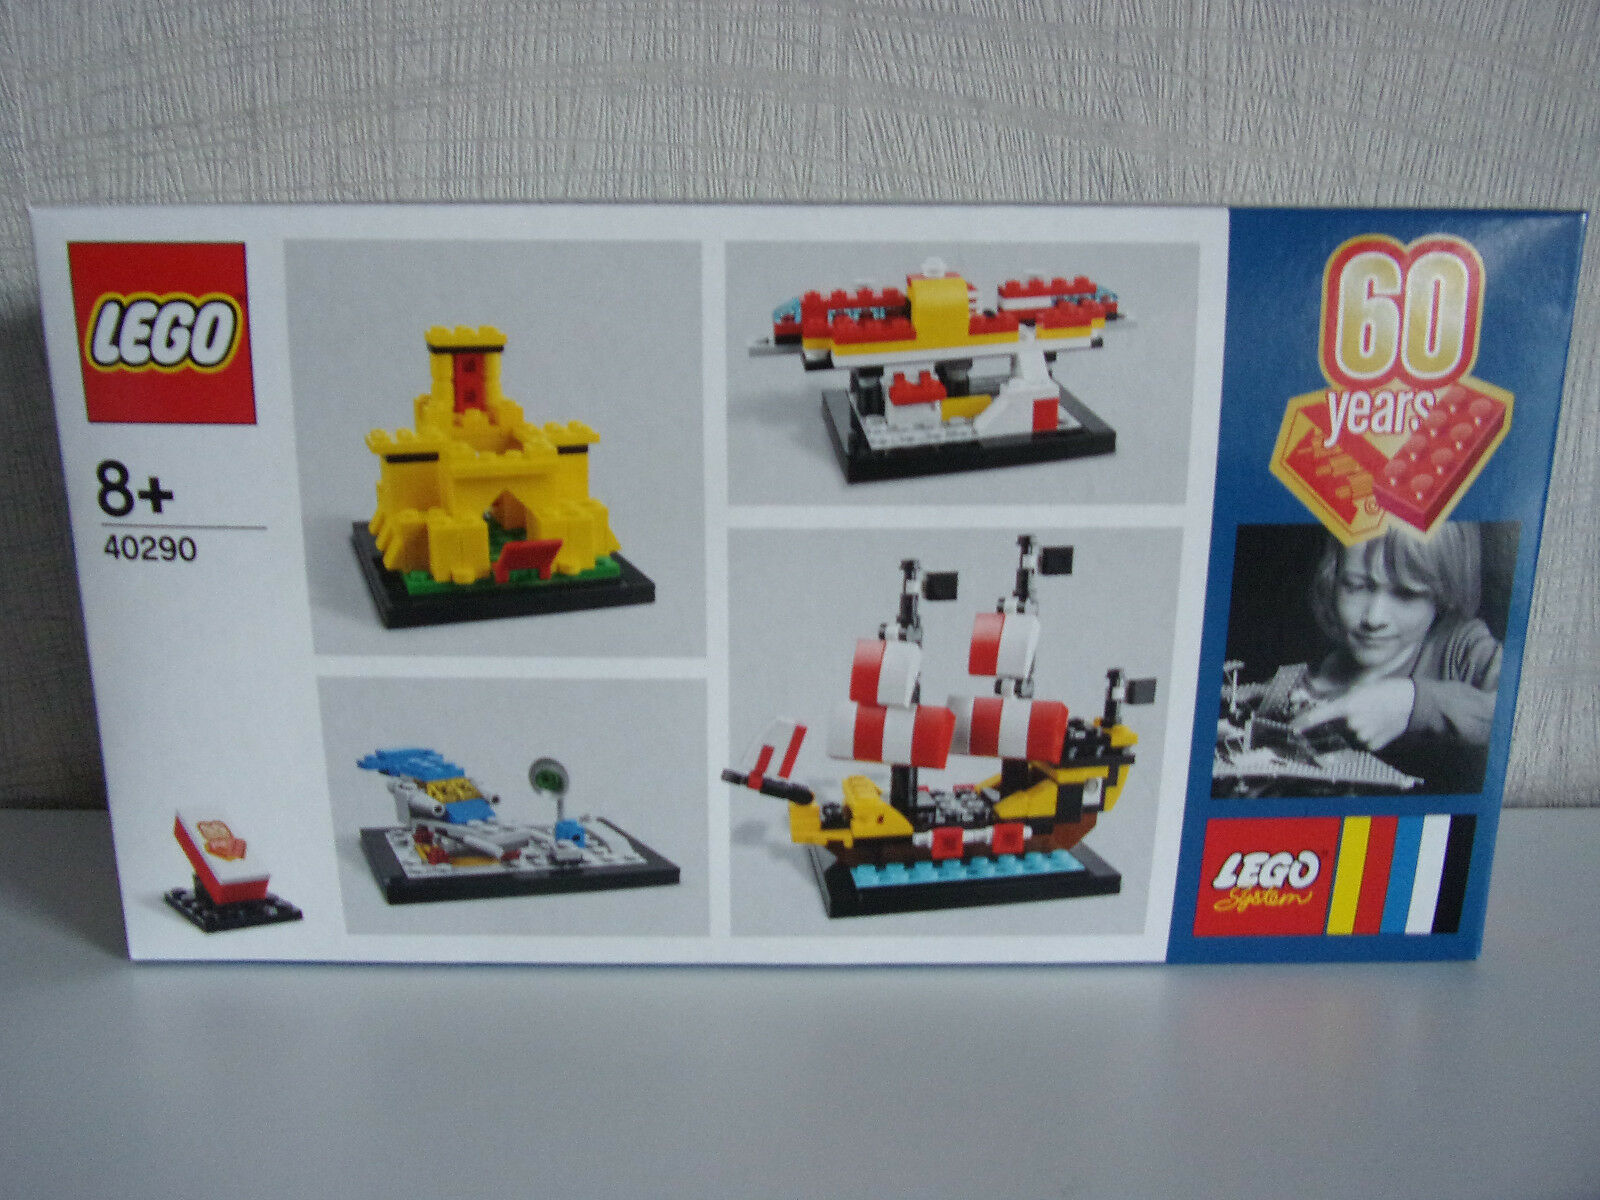 LEGO 40290 - 60 Jahre Years LEGO SET - NIP